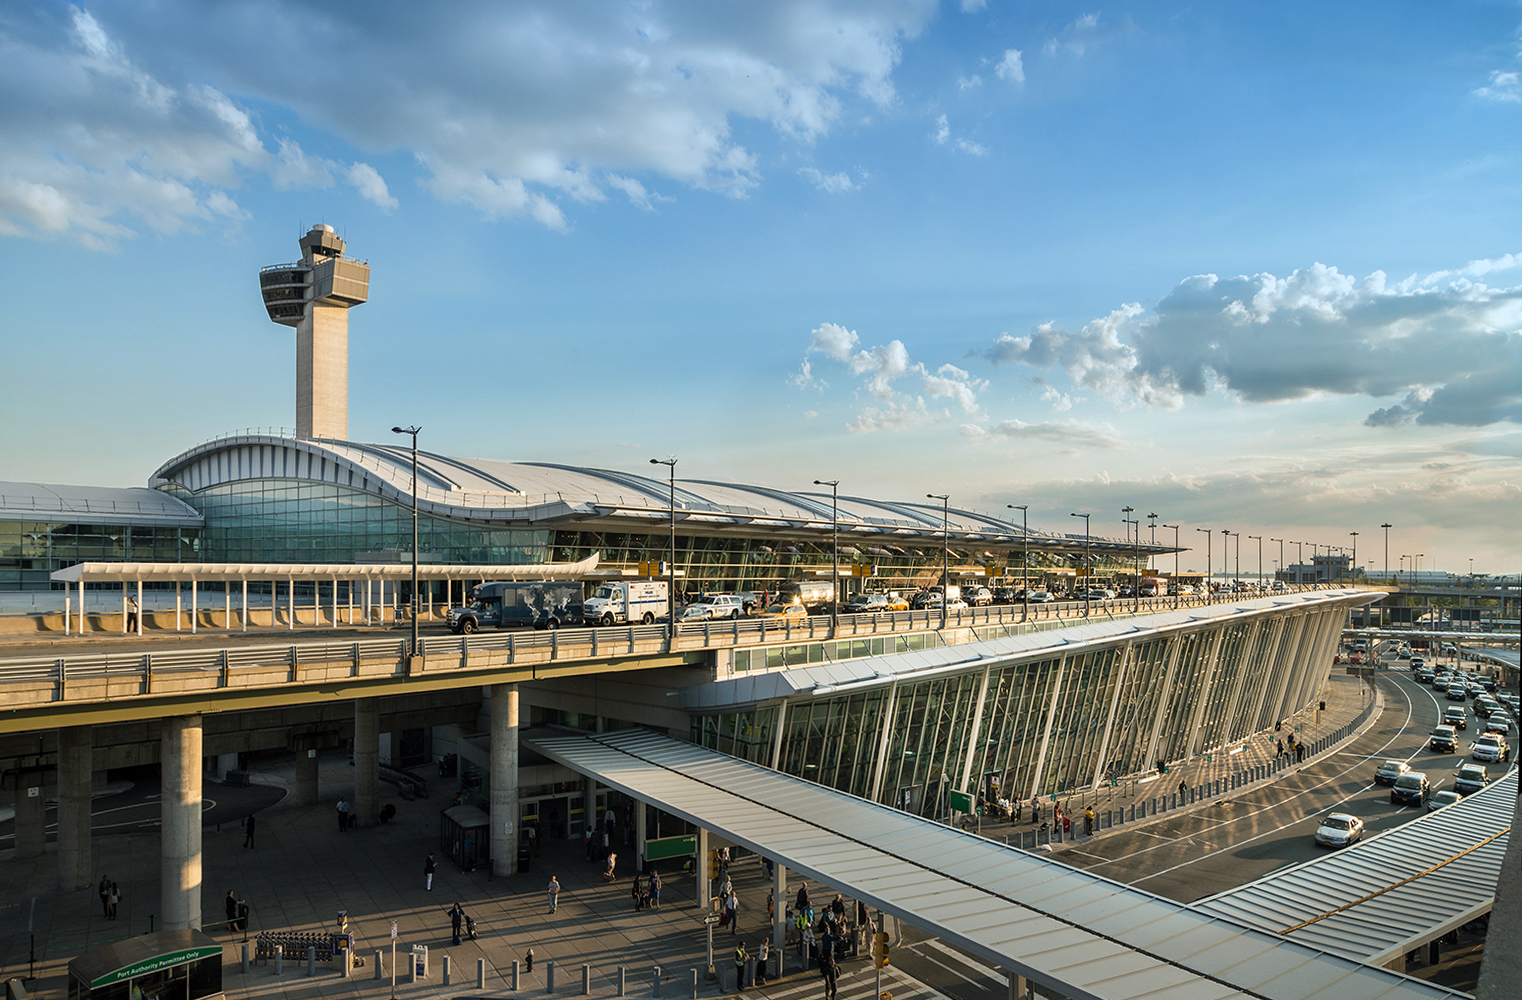 JFK Airport's Terminal 4 enhances airline operations